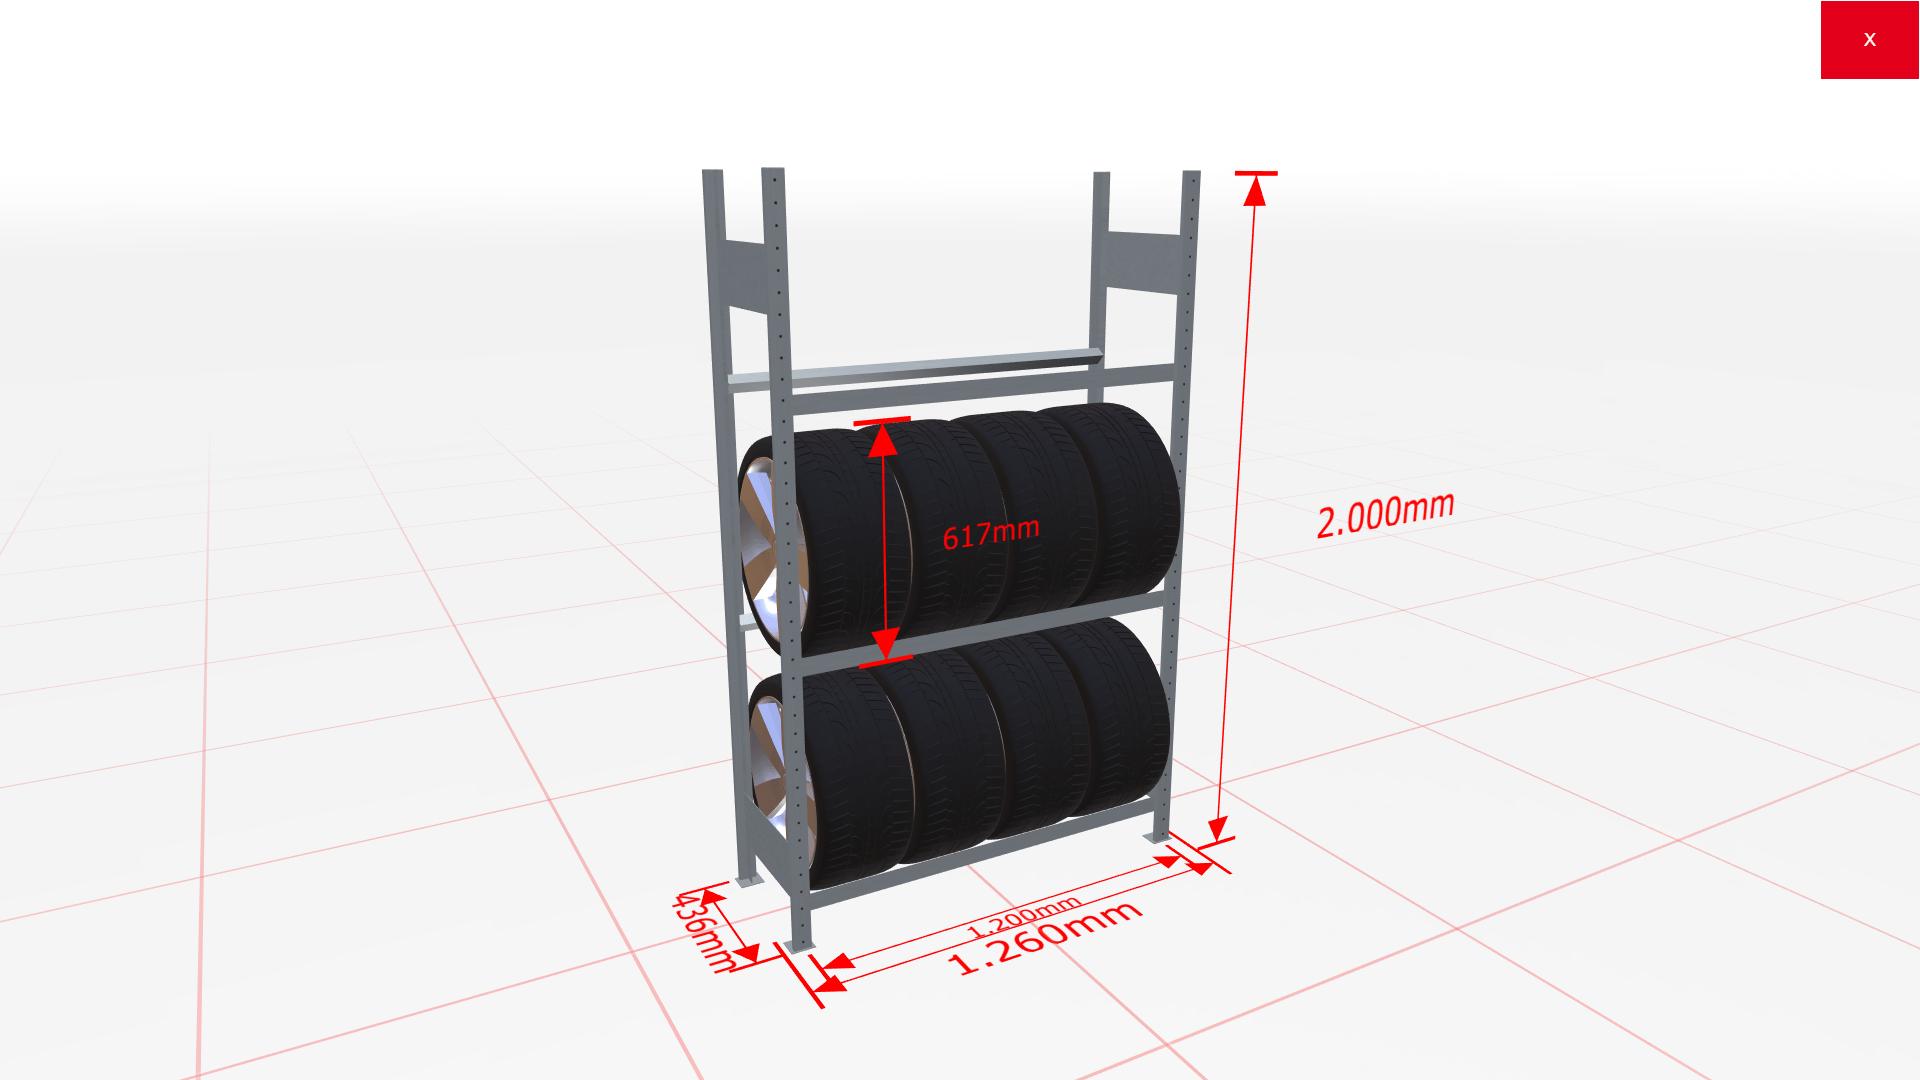 Räderregal Grundregal SCHULTE Lagertechnik 2000x1200x400 mm – 3 Ebenen á 1200 mm, verzinkt